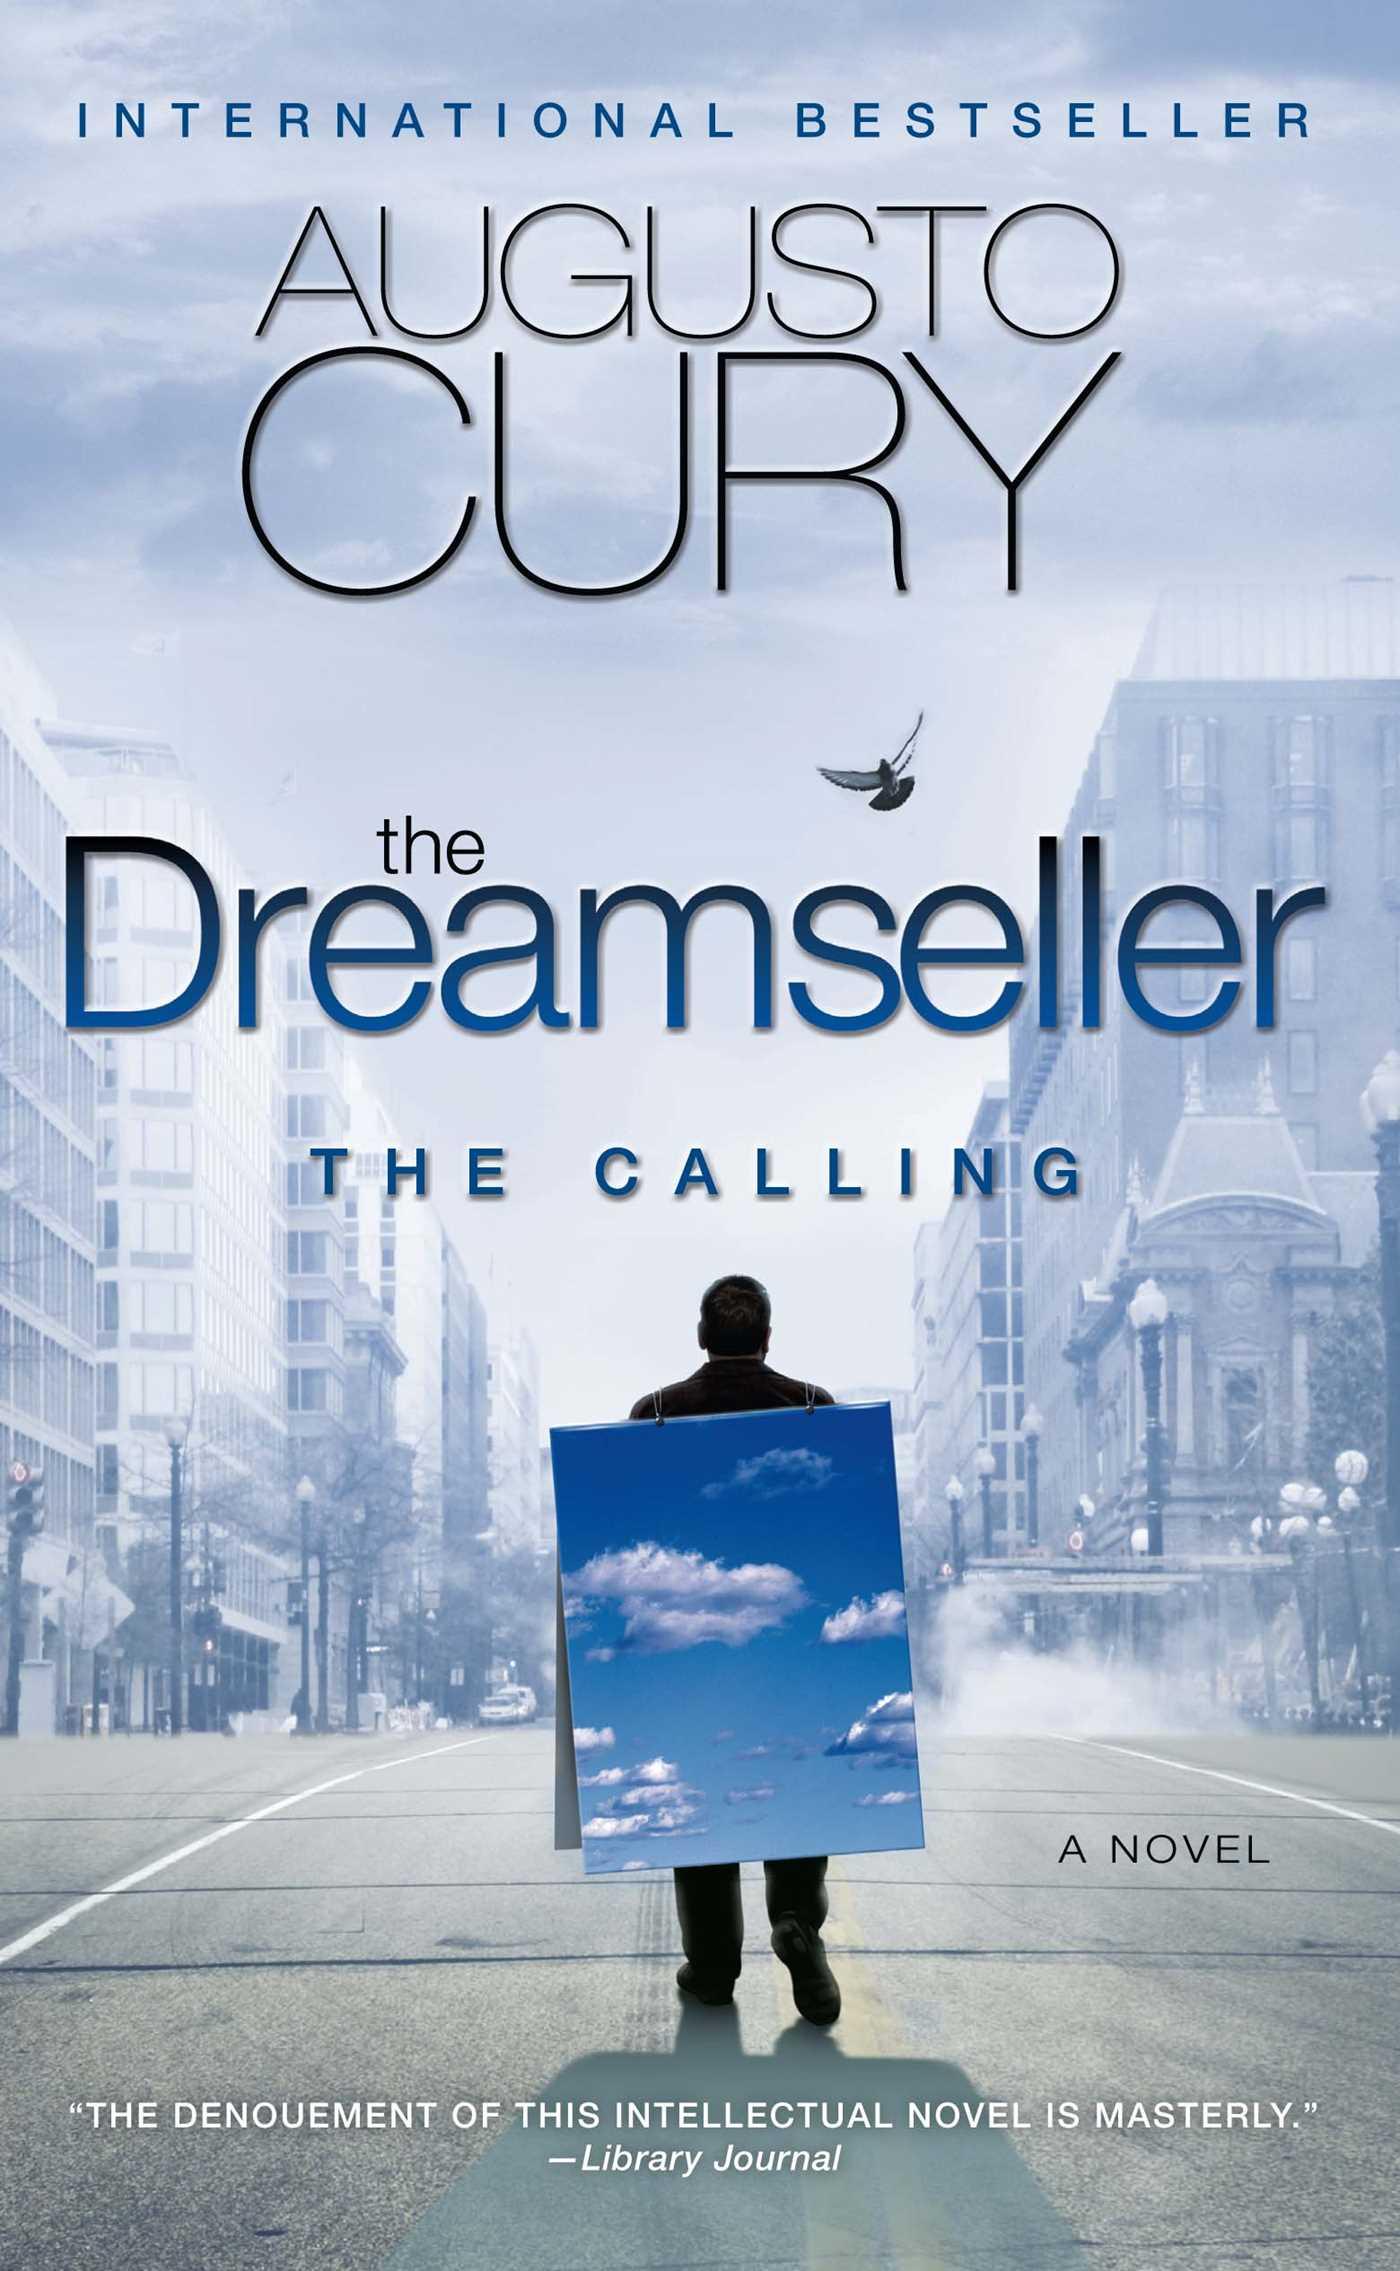 Dreamseller the calling 9781439195734 hr